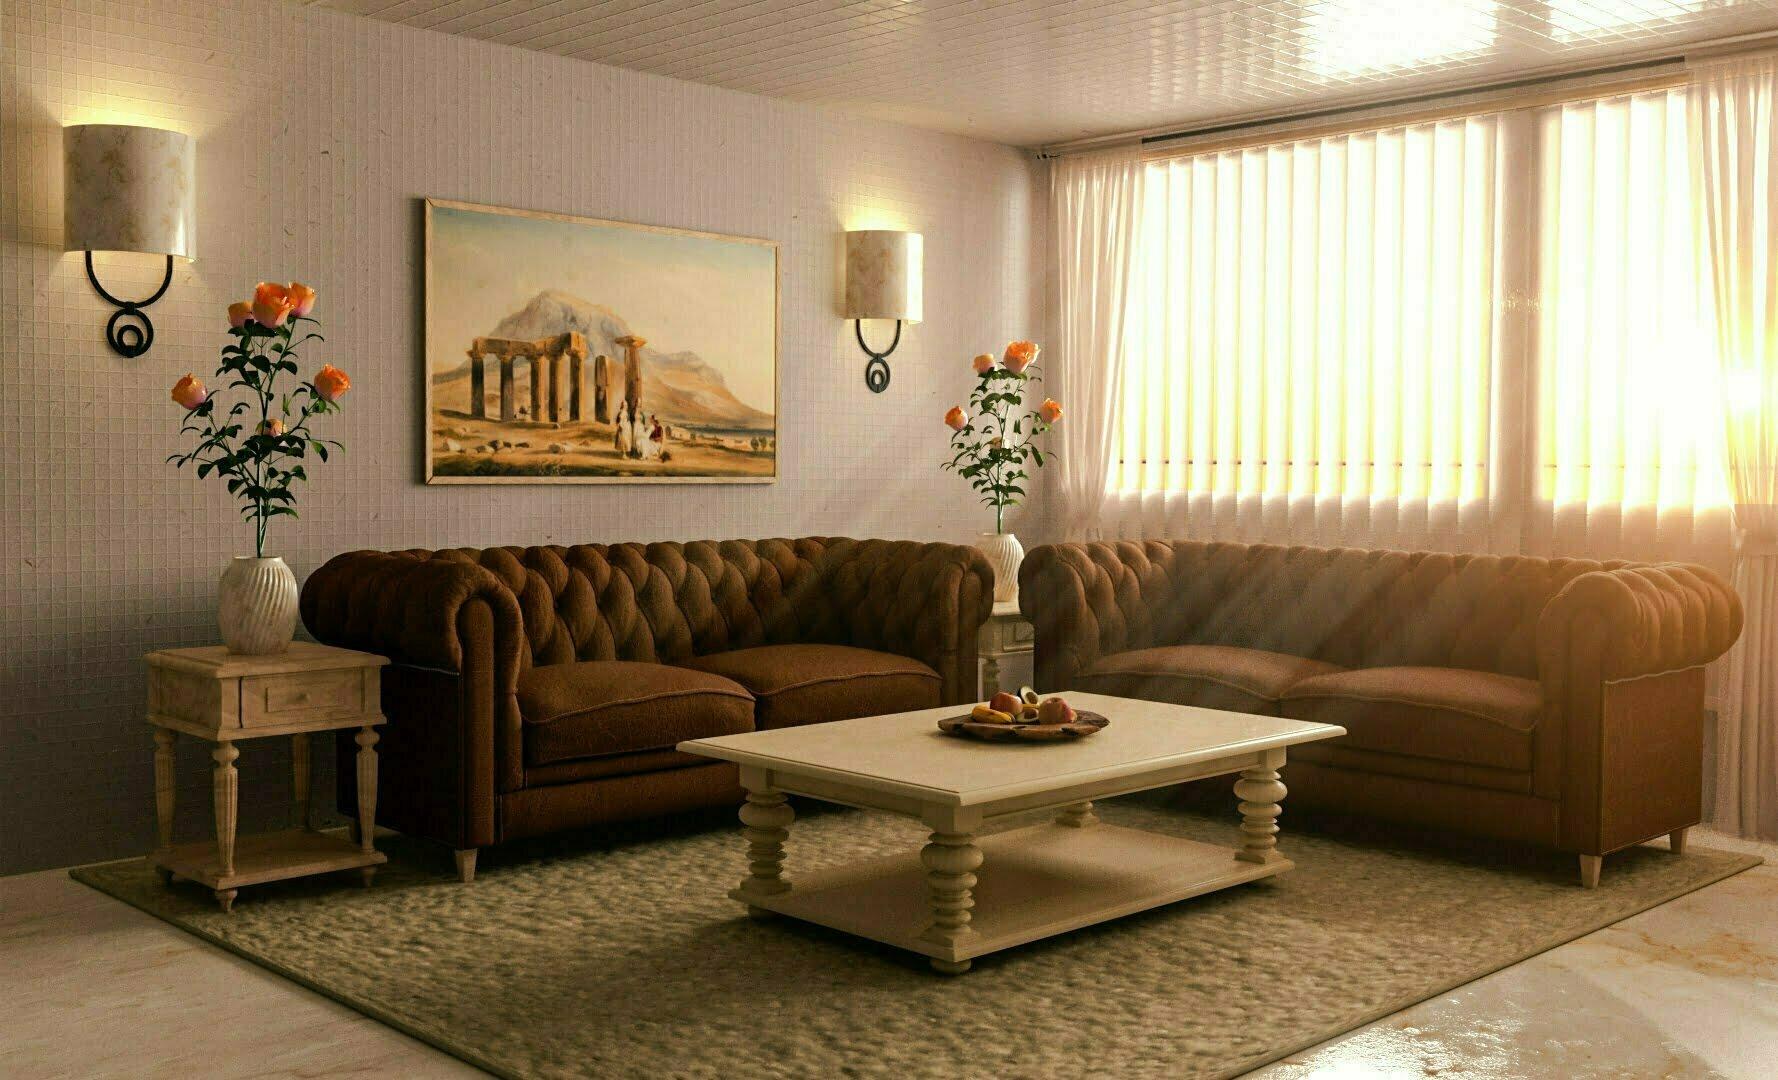 Pixelwish, 3D Design, Interior, Visualization, Living Room, Warm, Daylight